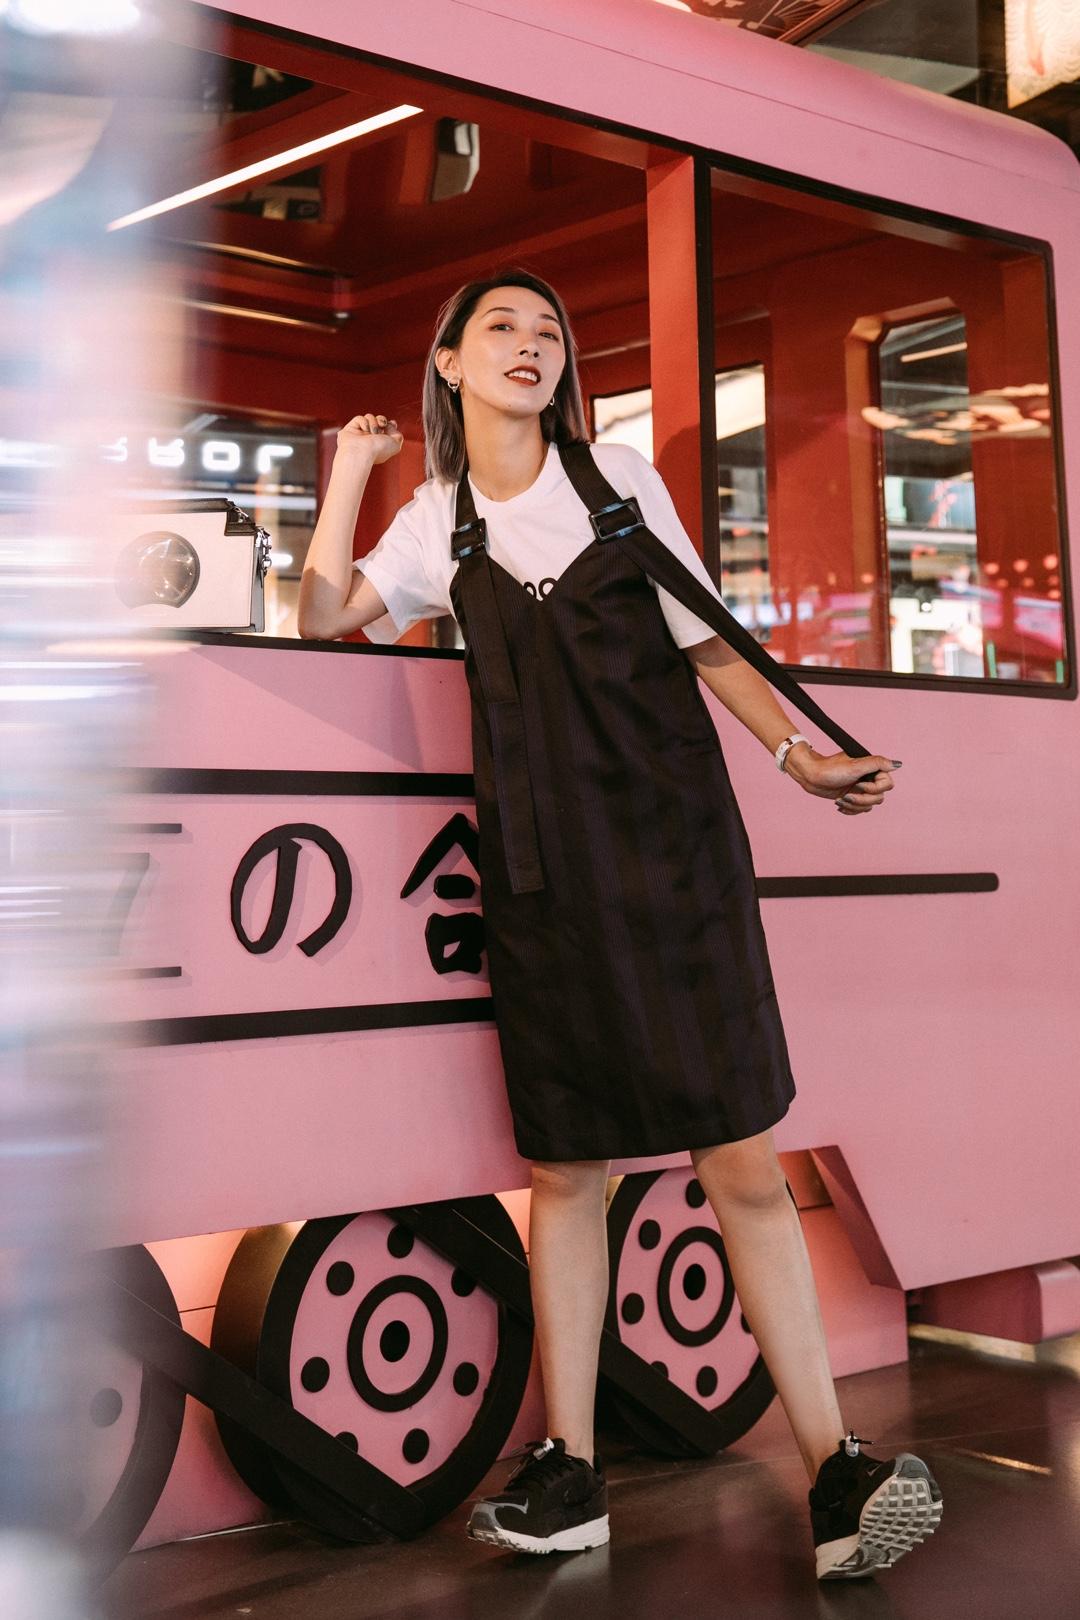 "ViLook | Vol.291 ———— 背带裙是增加少女感的最佳单品之一!A字型的剪裁完美藏肉,隐约可见的条纹瞬间显瘦!随意内搭一件白T都能让你瞬间找回校园🎓时光!我搭配了一双黑色球鞋,当然最经典的小白鞋👟也是很棒的选择!耳环是左右不对称的,给简约的一身制造些惊喜!这个包包有个有趣的名字""南墙包""!背着它,让所有人撞见都统统回头吧! #100%港味少女养成记#"